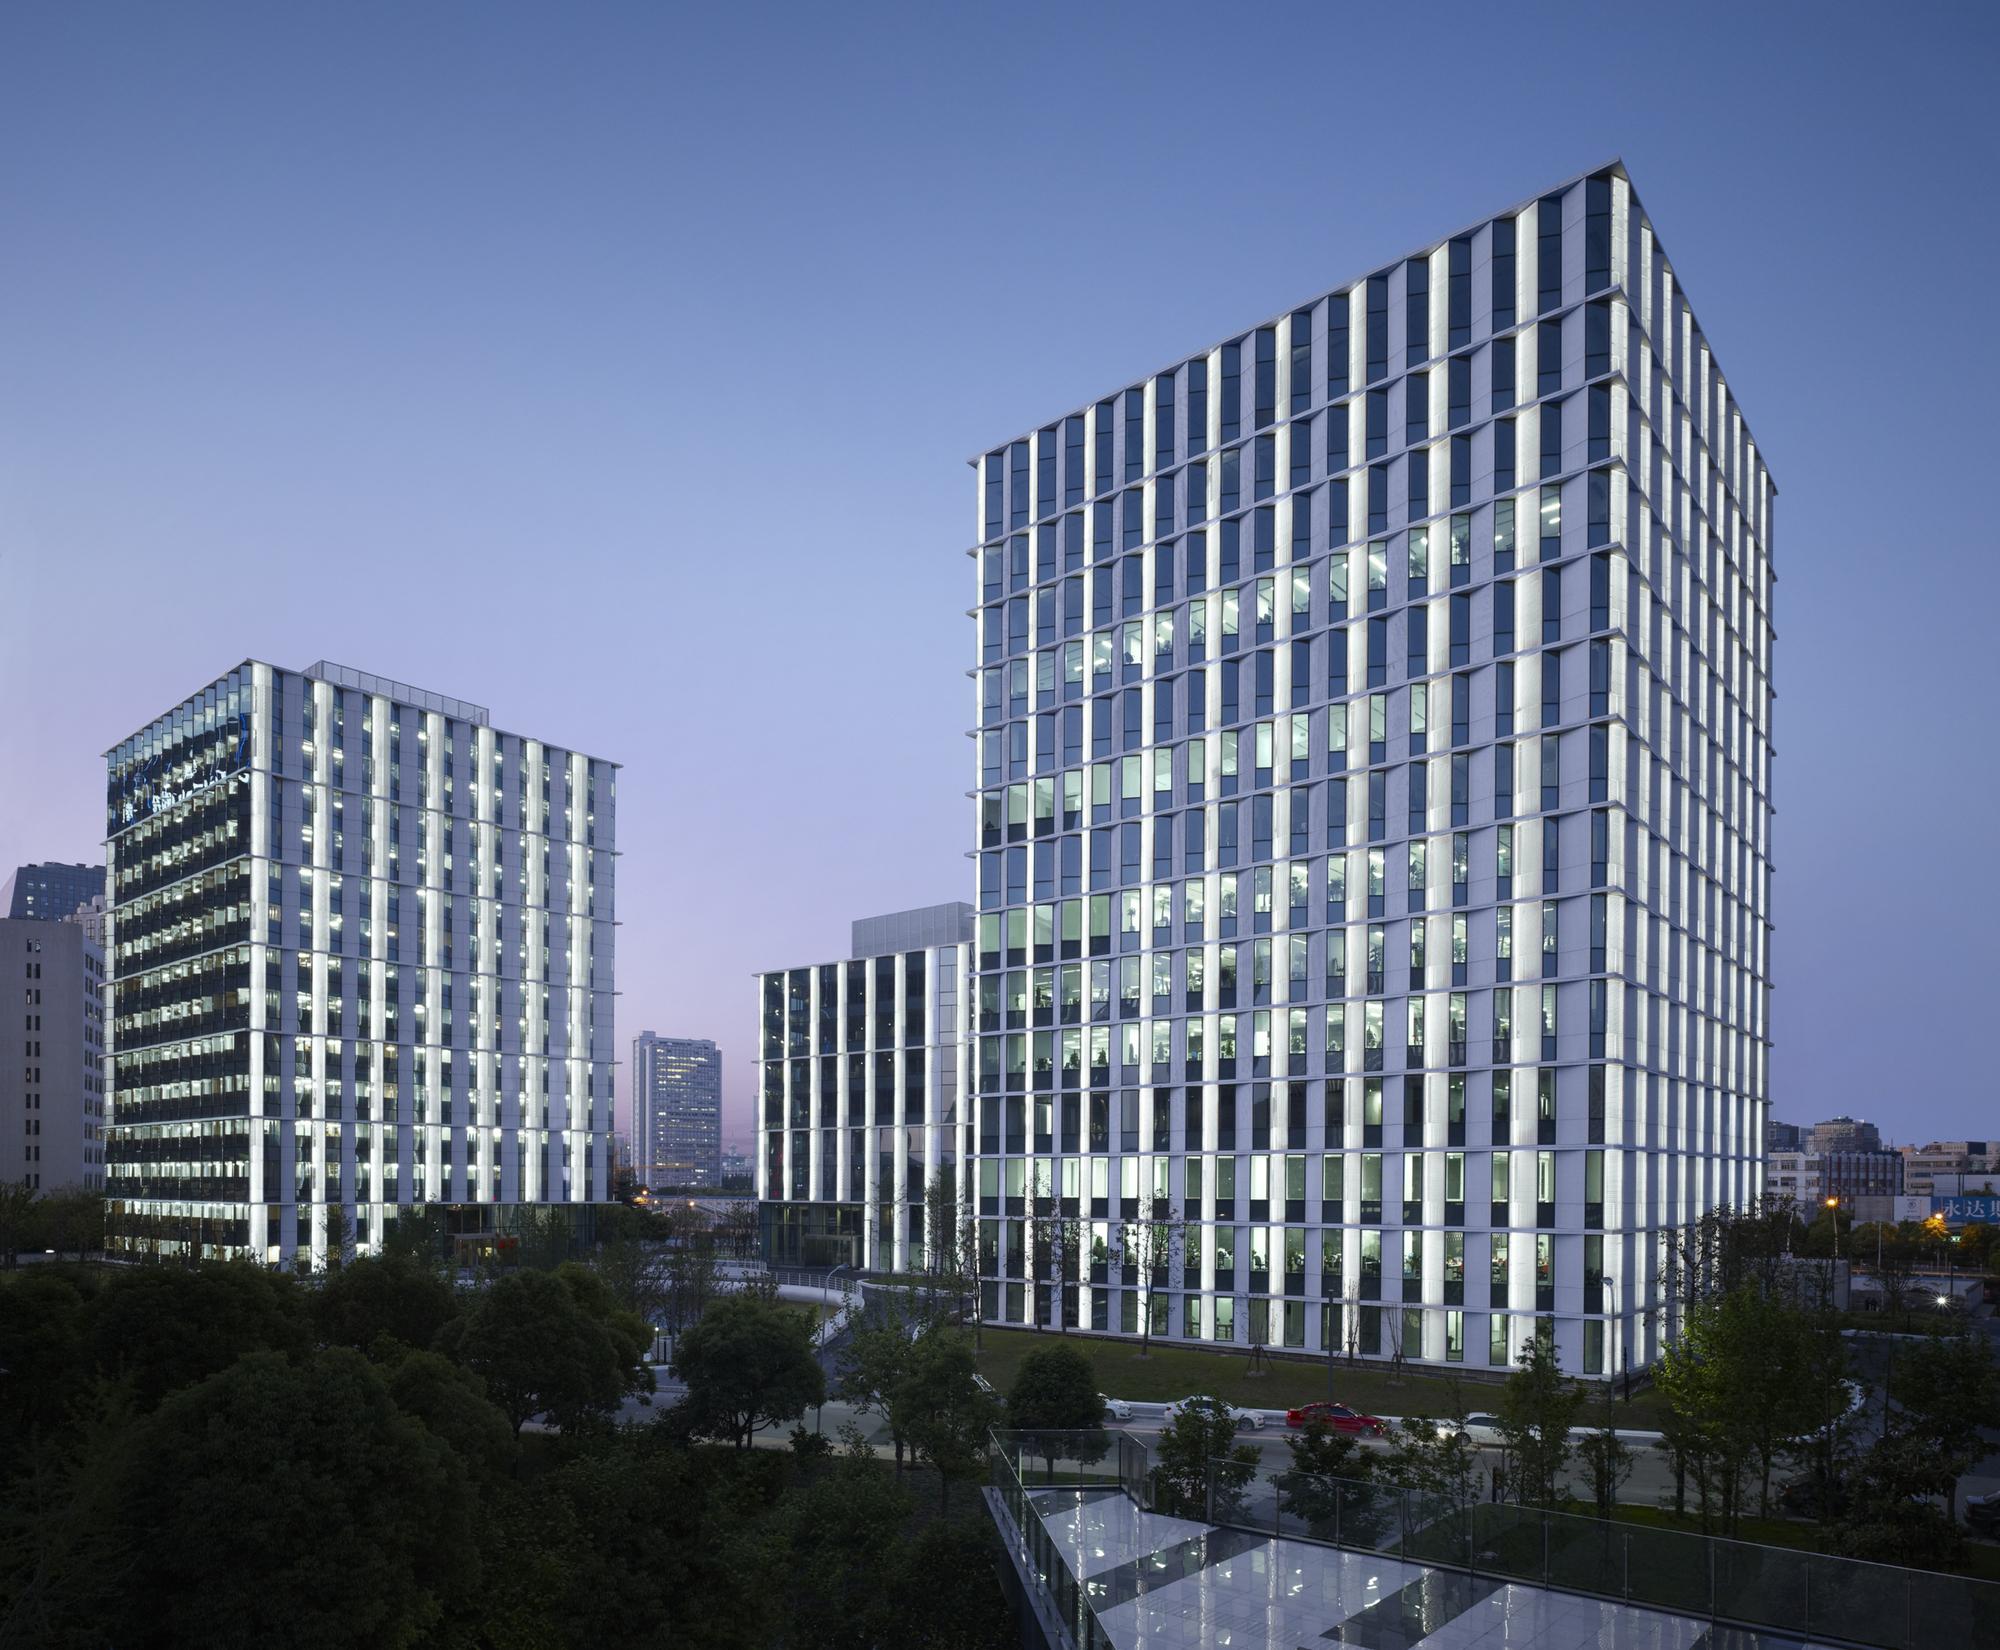 Gallery of 3cubes office building gmp architekten 7 - Gmp architektur ...